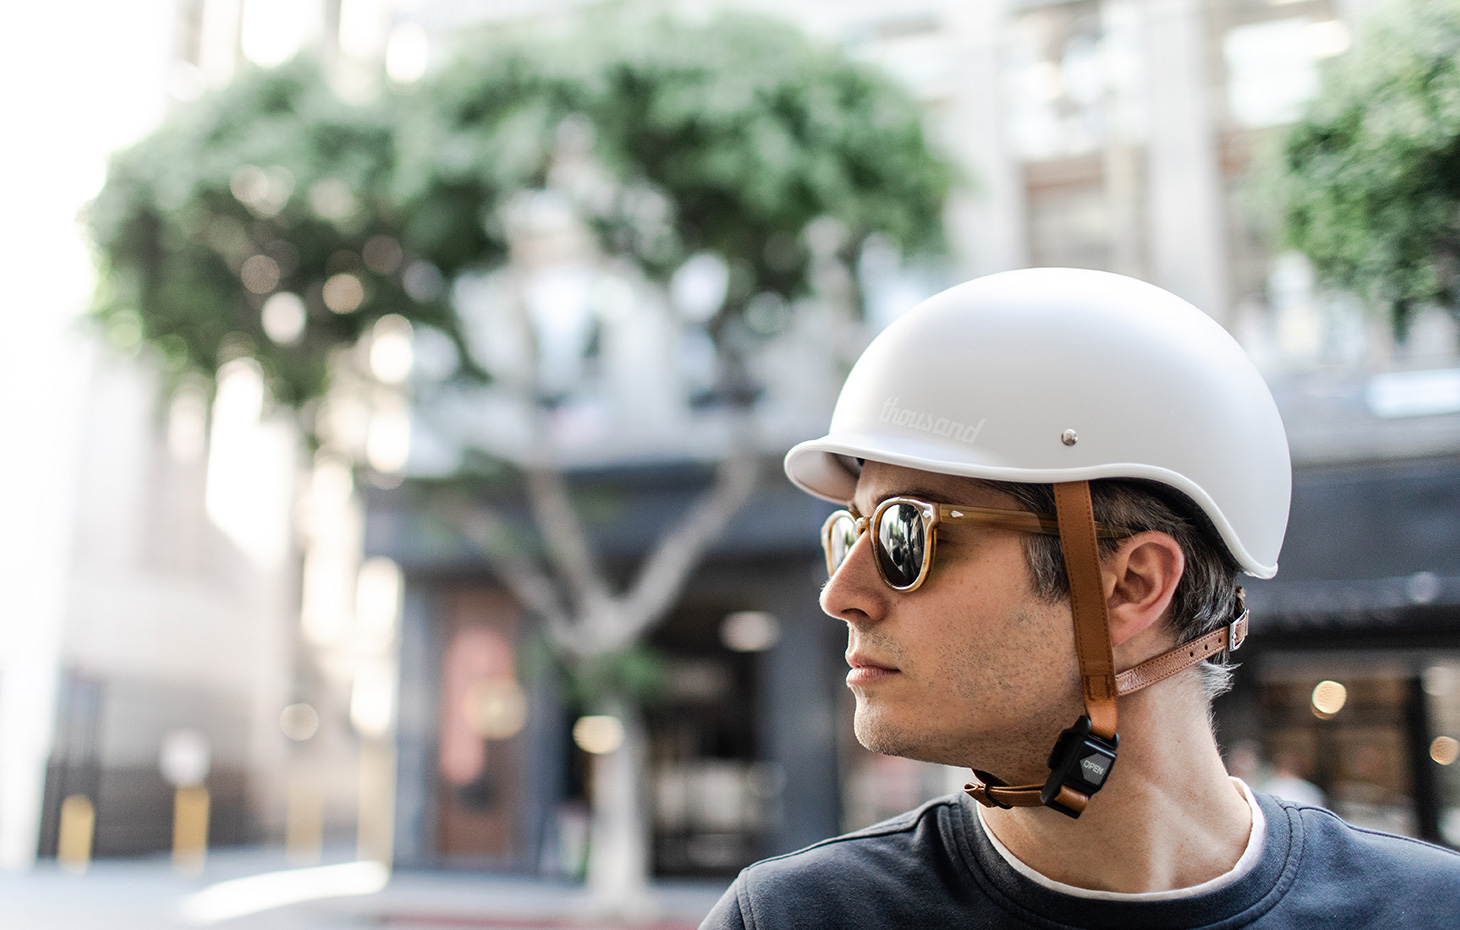 David wearing grey bike helmet